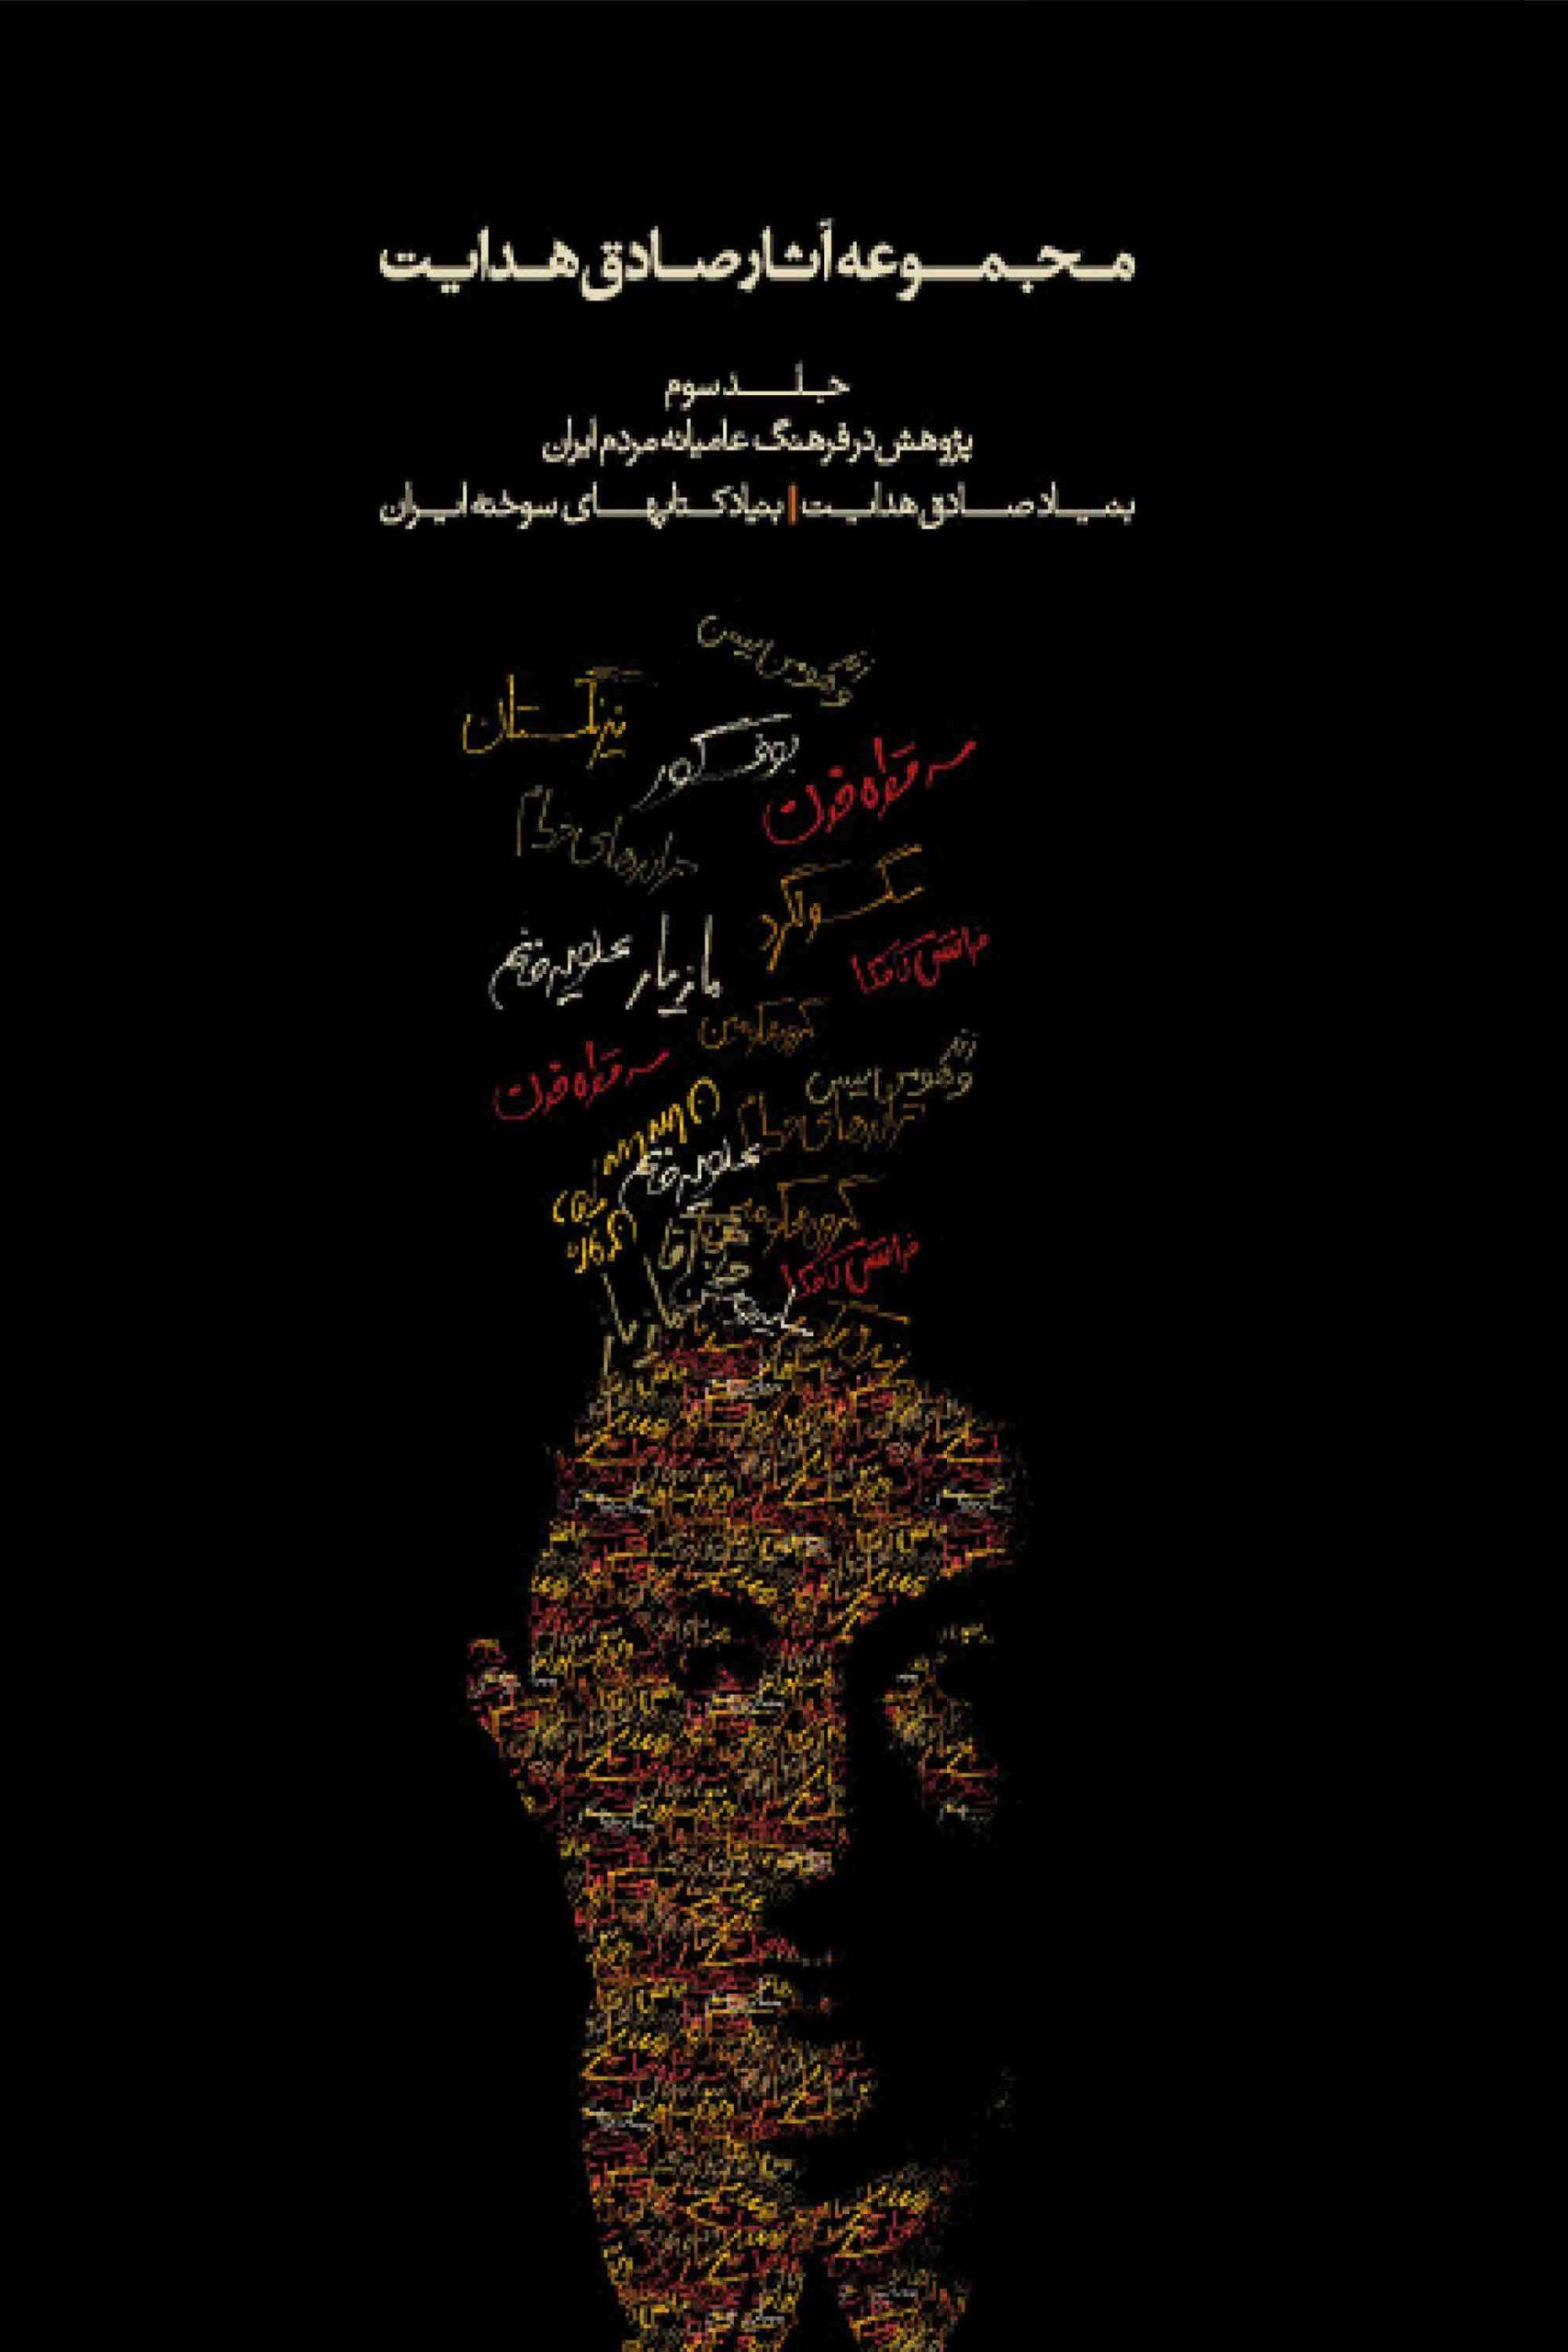 Sadegh Hedayat Vol. III – Studies on the Folklore of Iran